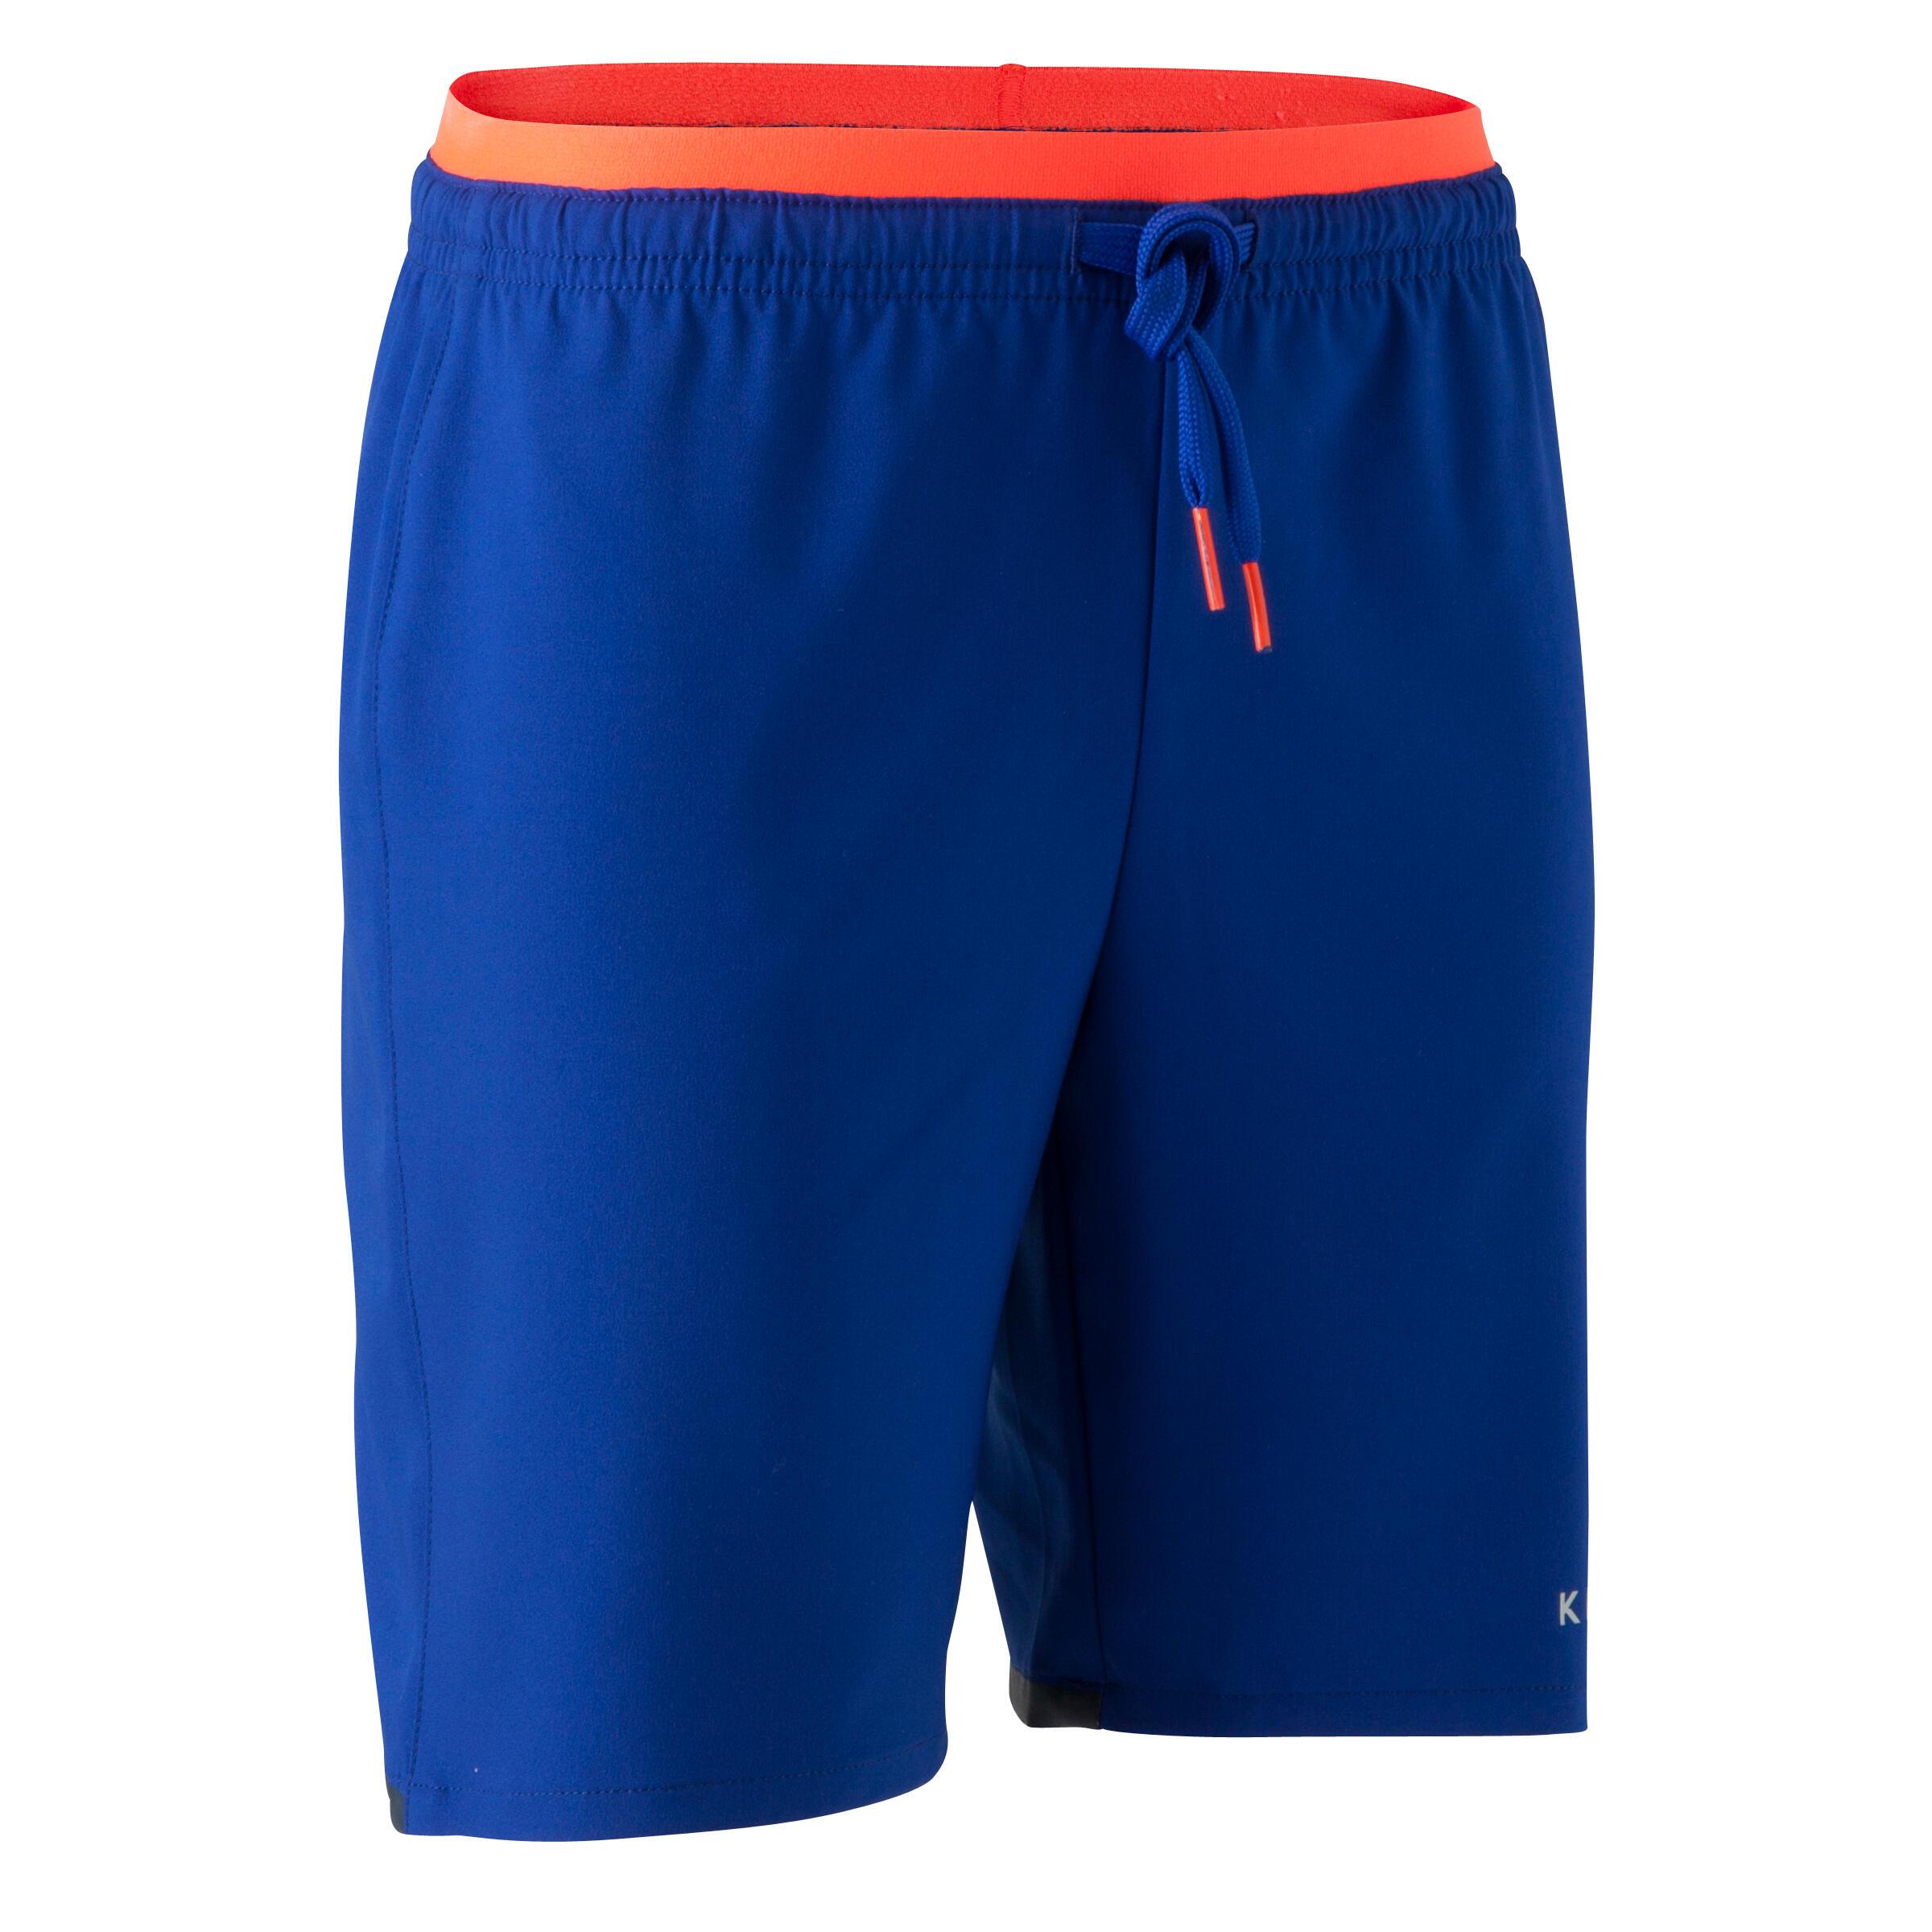 Short de fútbol niños F500 azul índigo